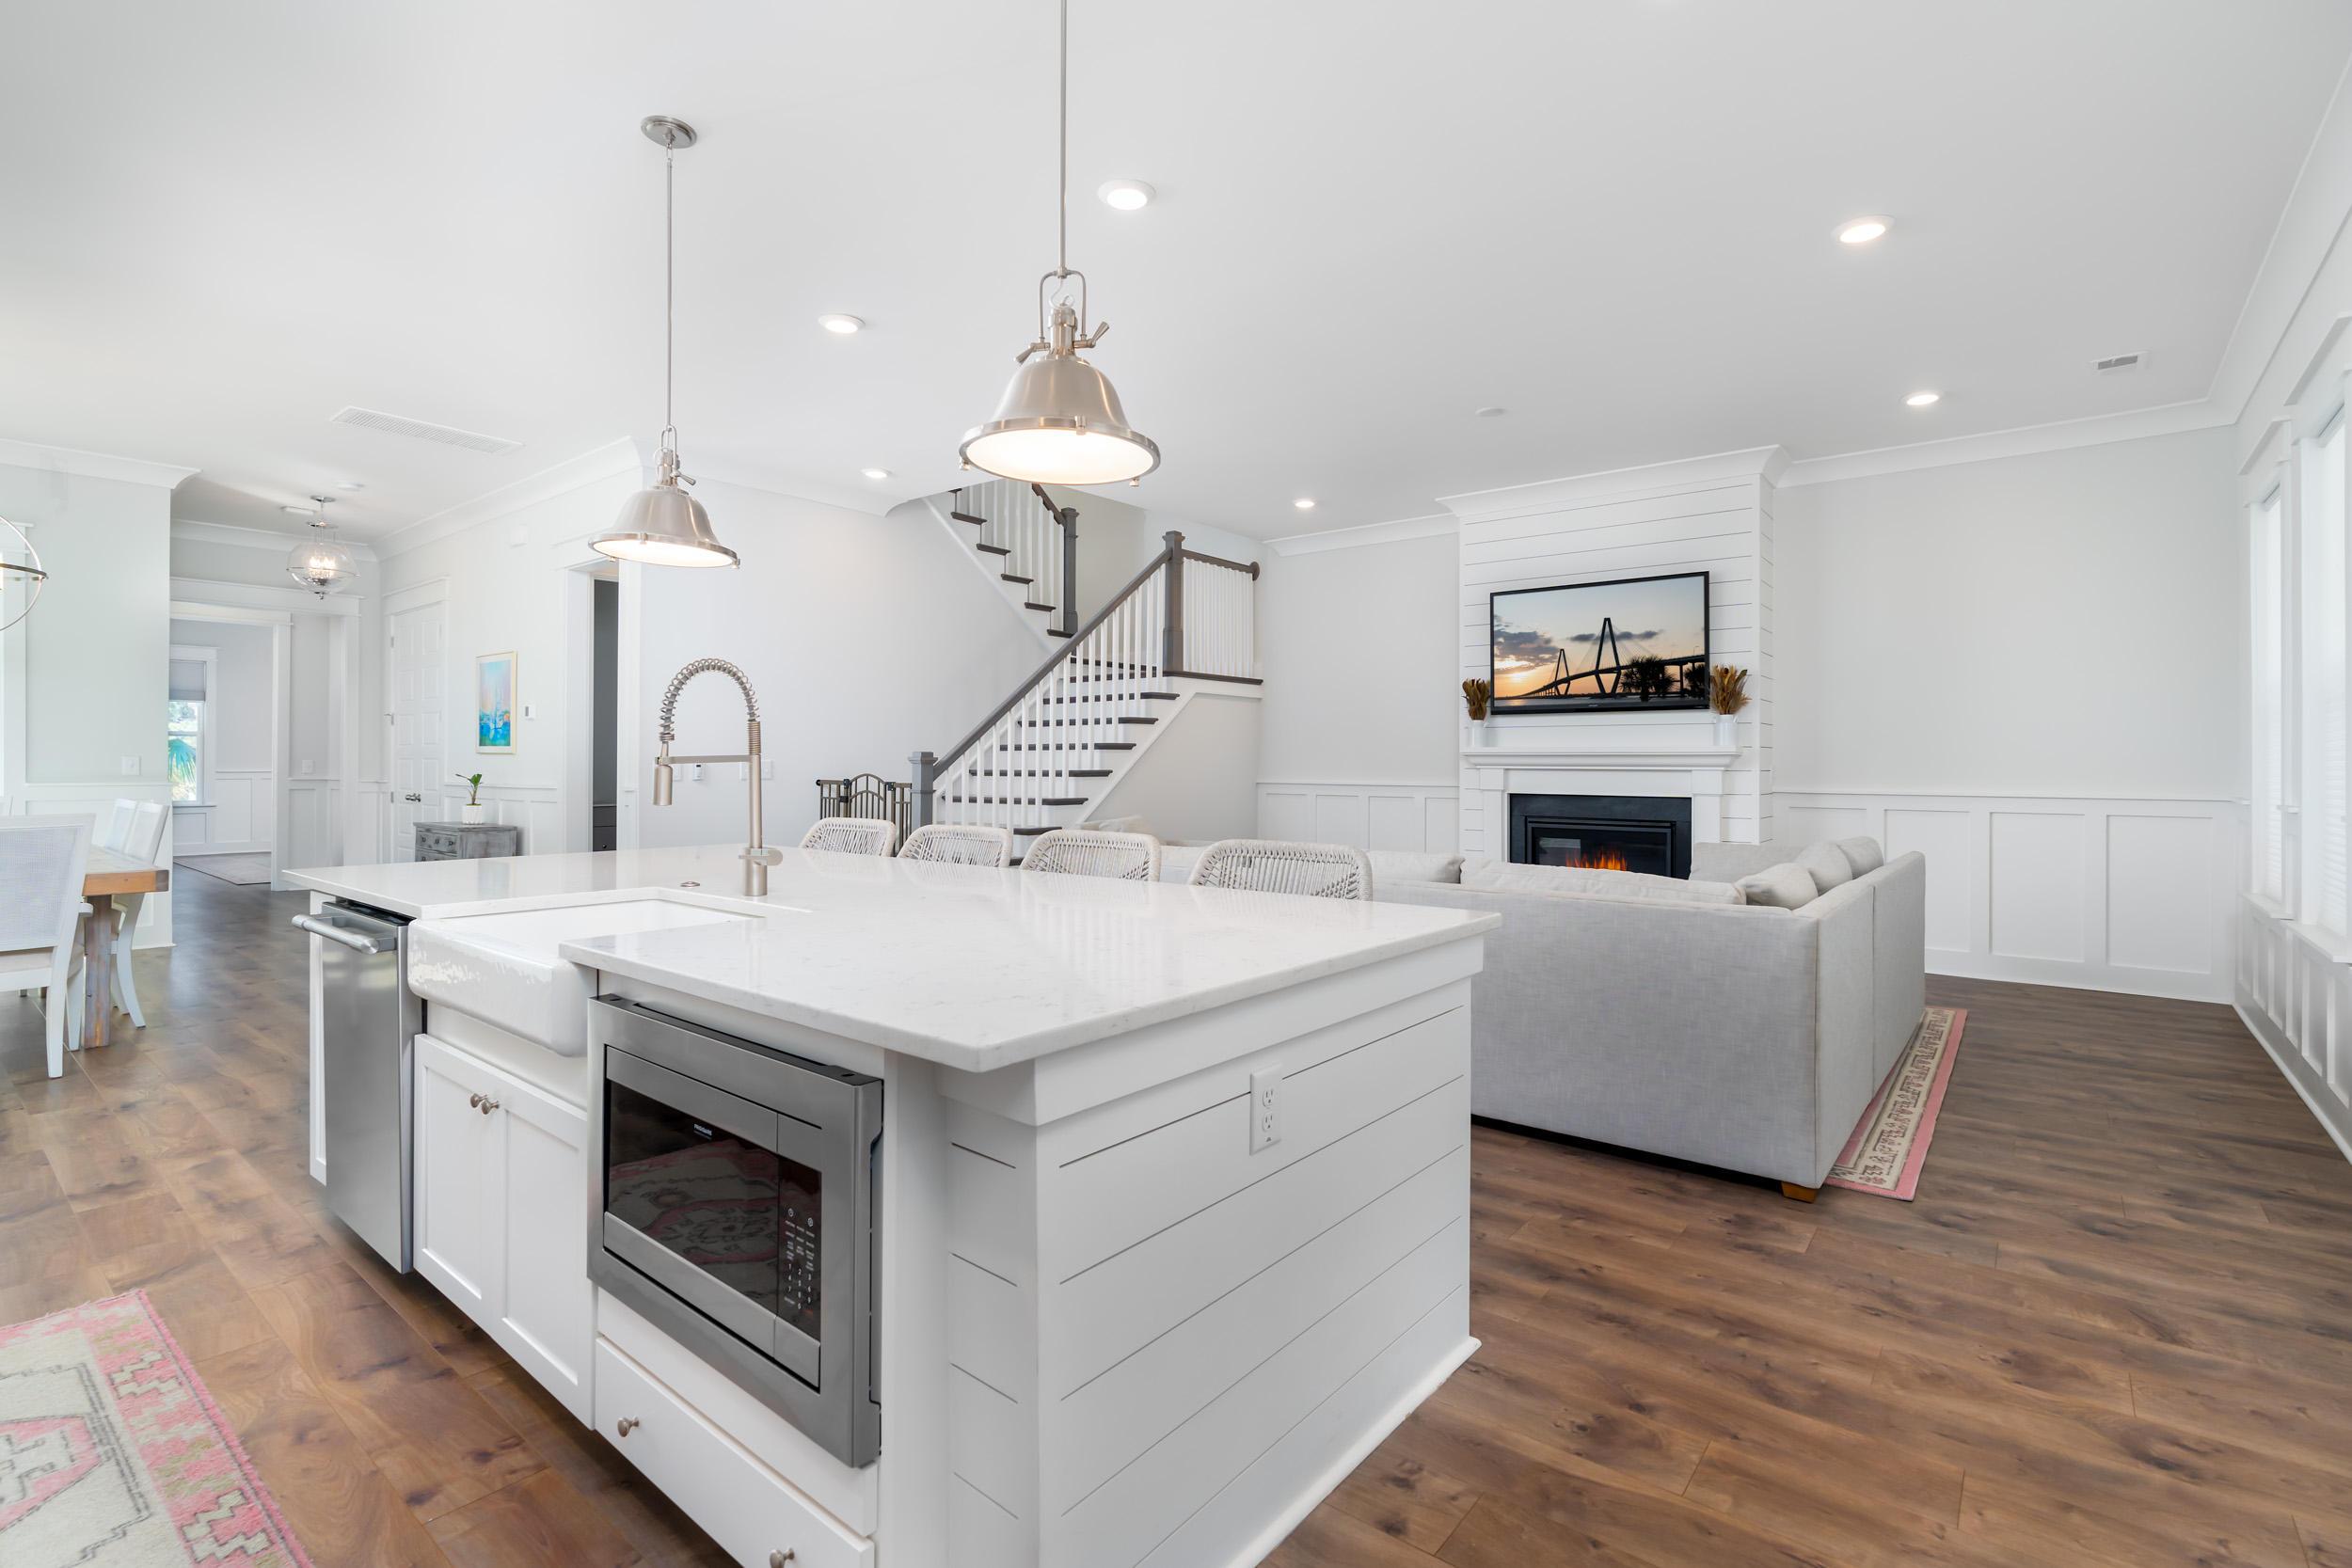 Hamlin Oaks Homes For Sale - 2921 Tranquility, Mount Pleasant, SC - 8